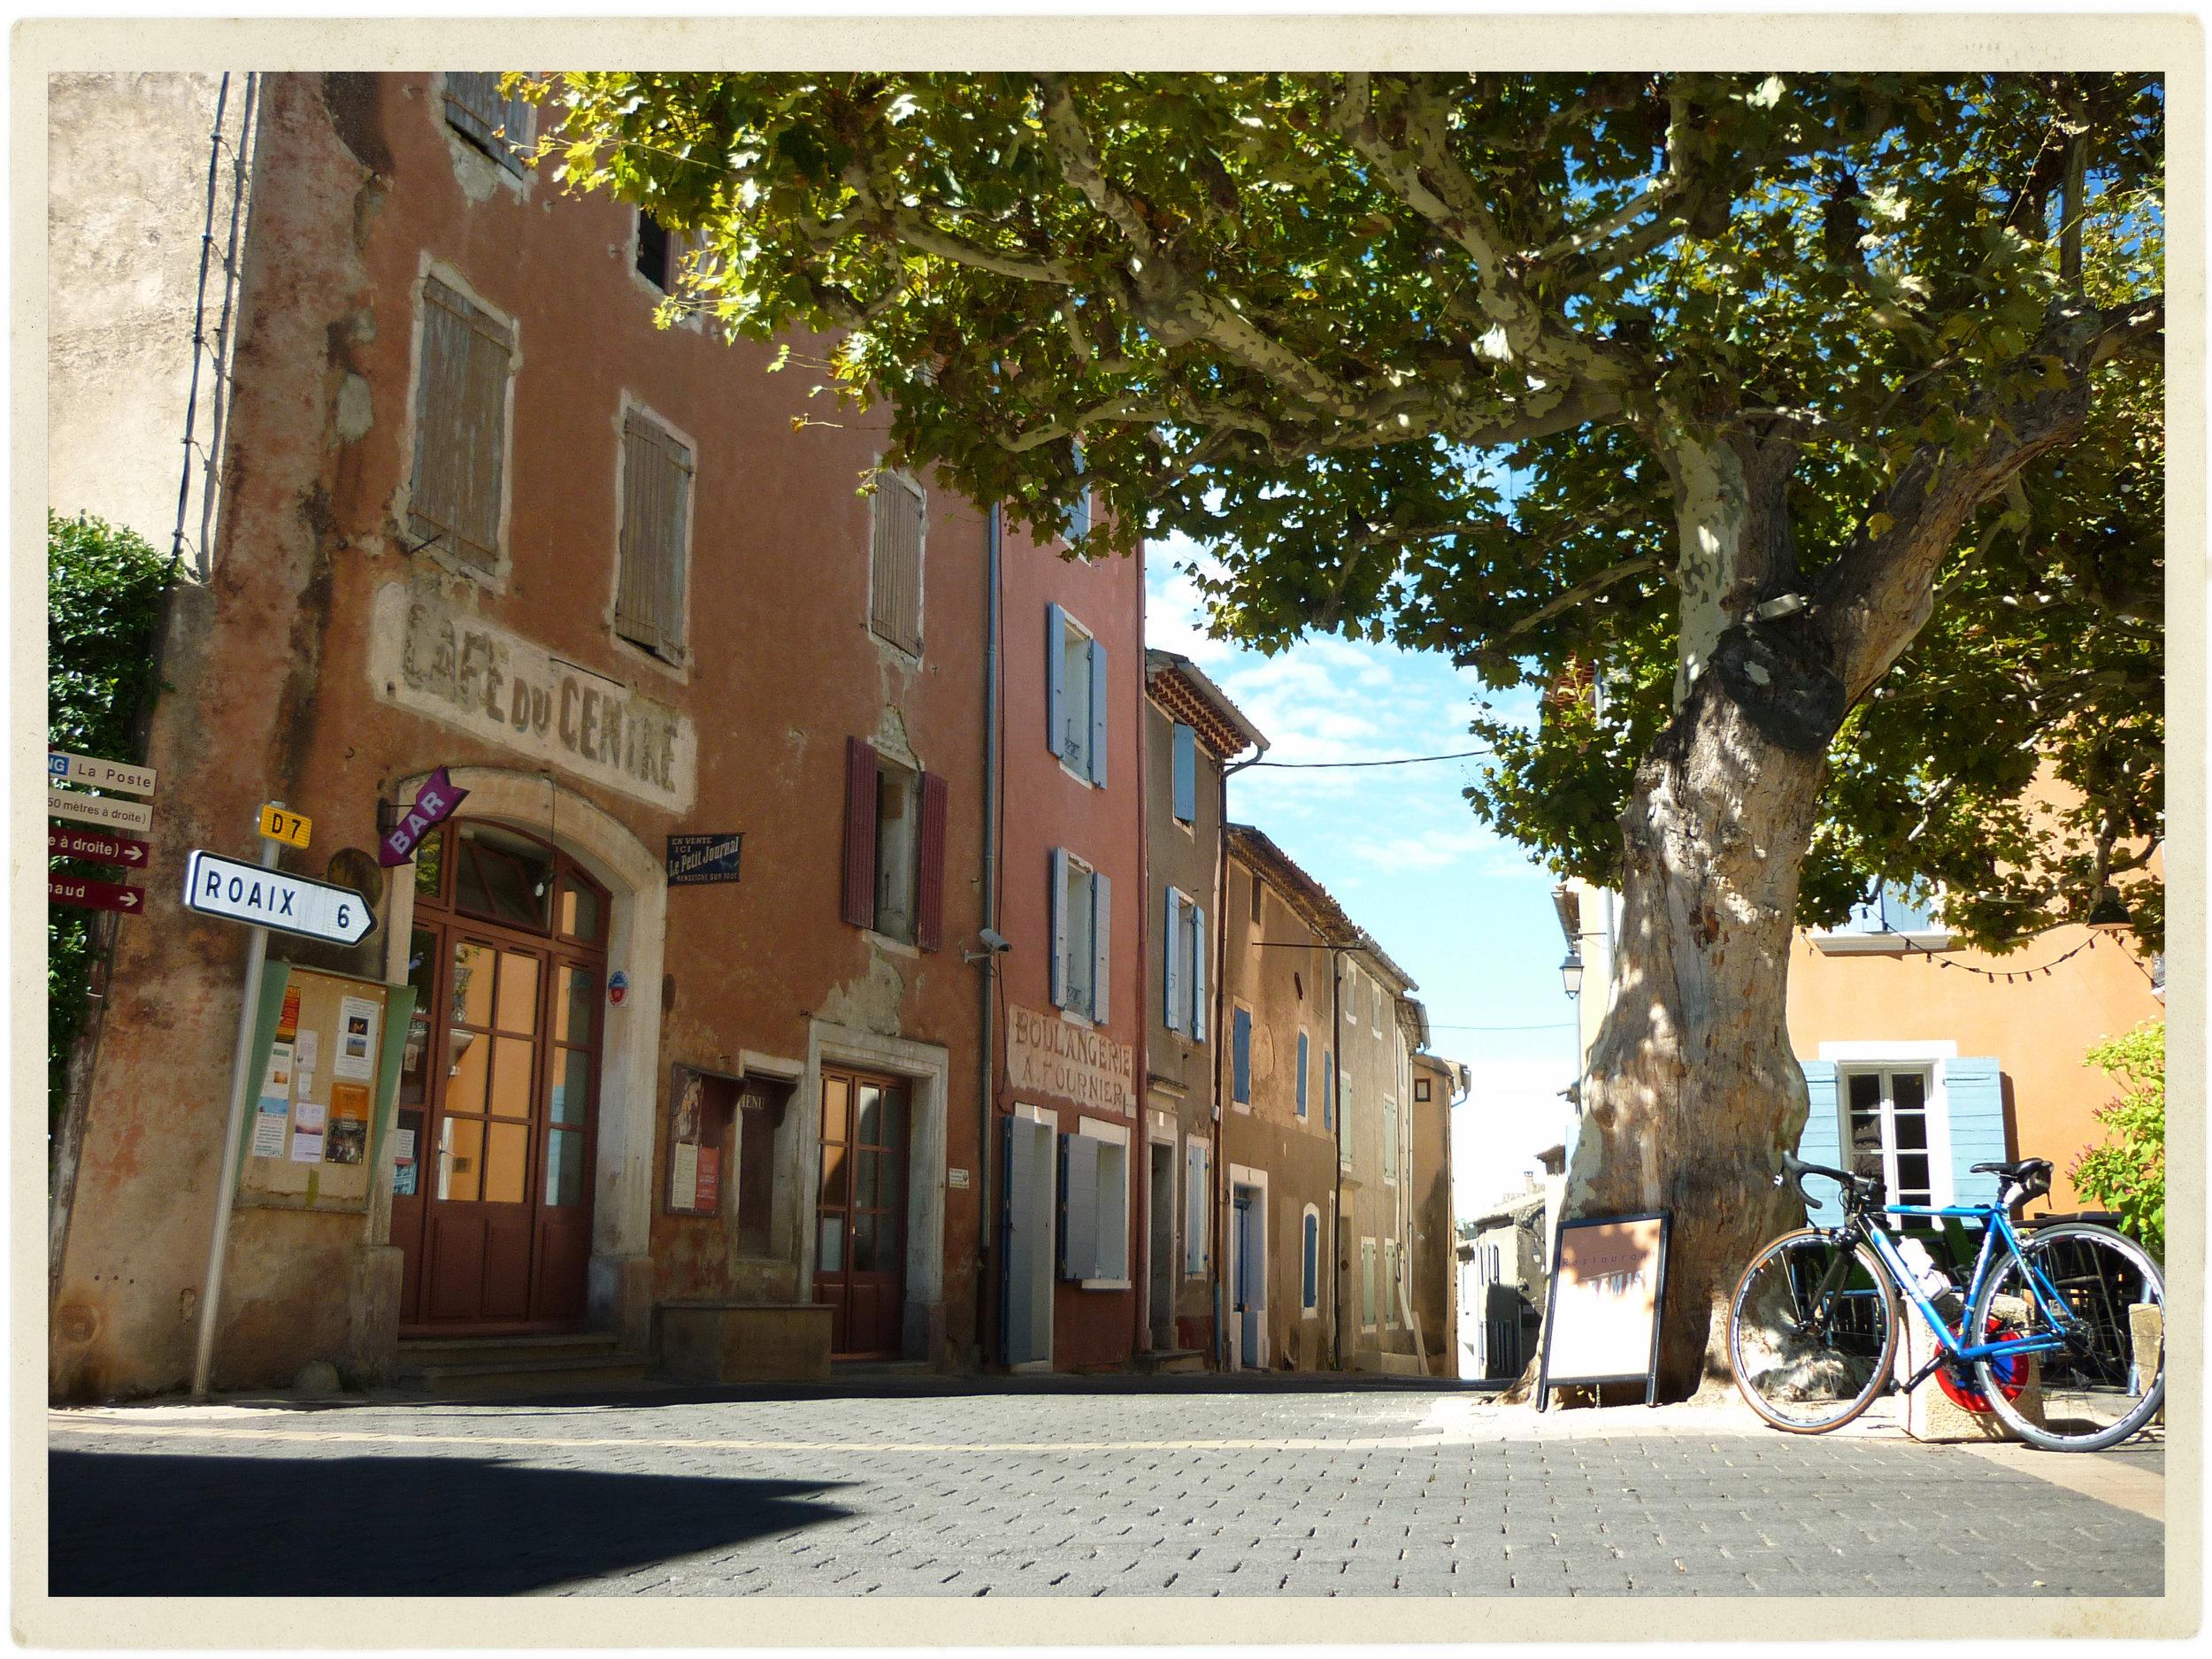 Village of Villedieu in the Drôme. Love riding through here...